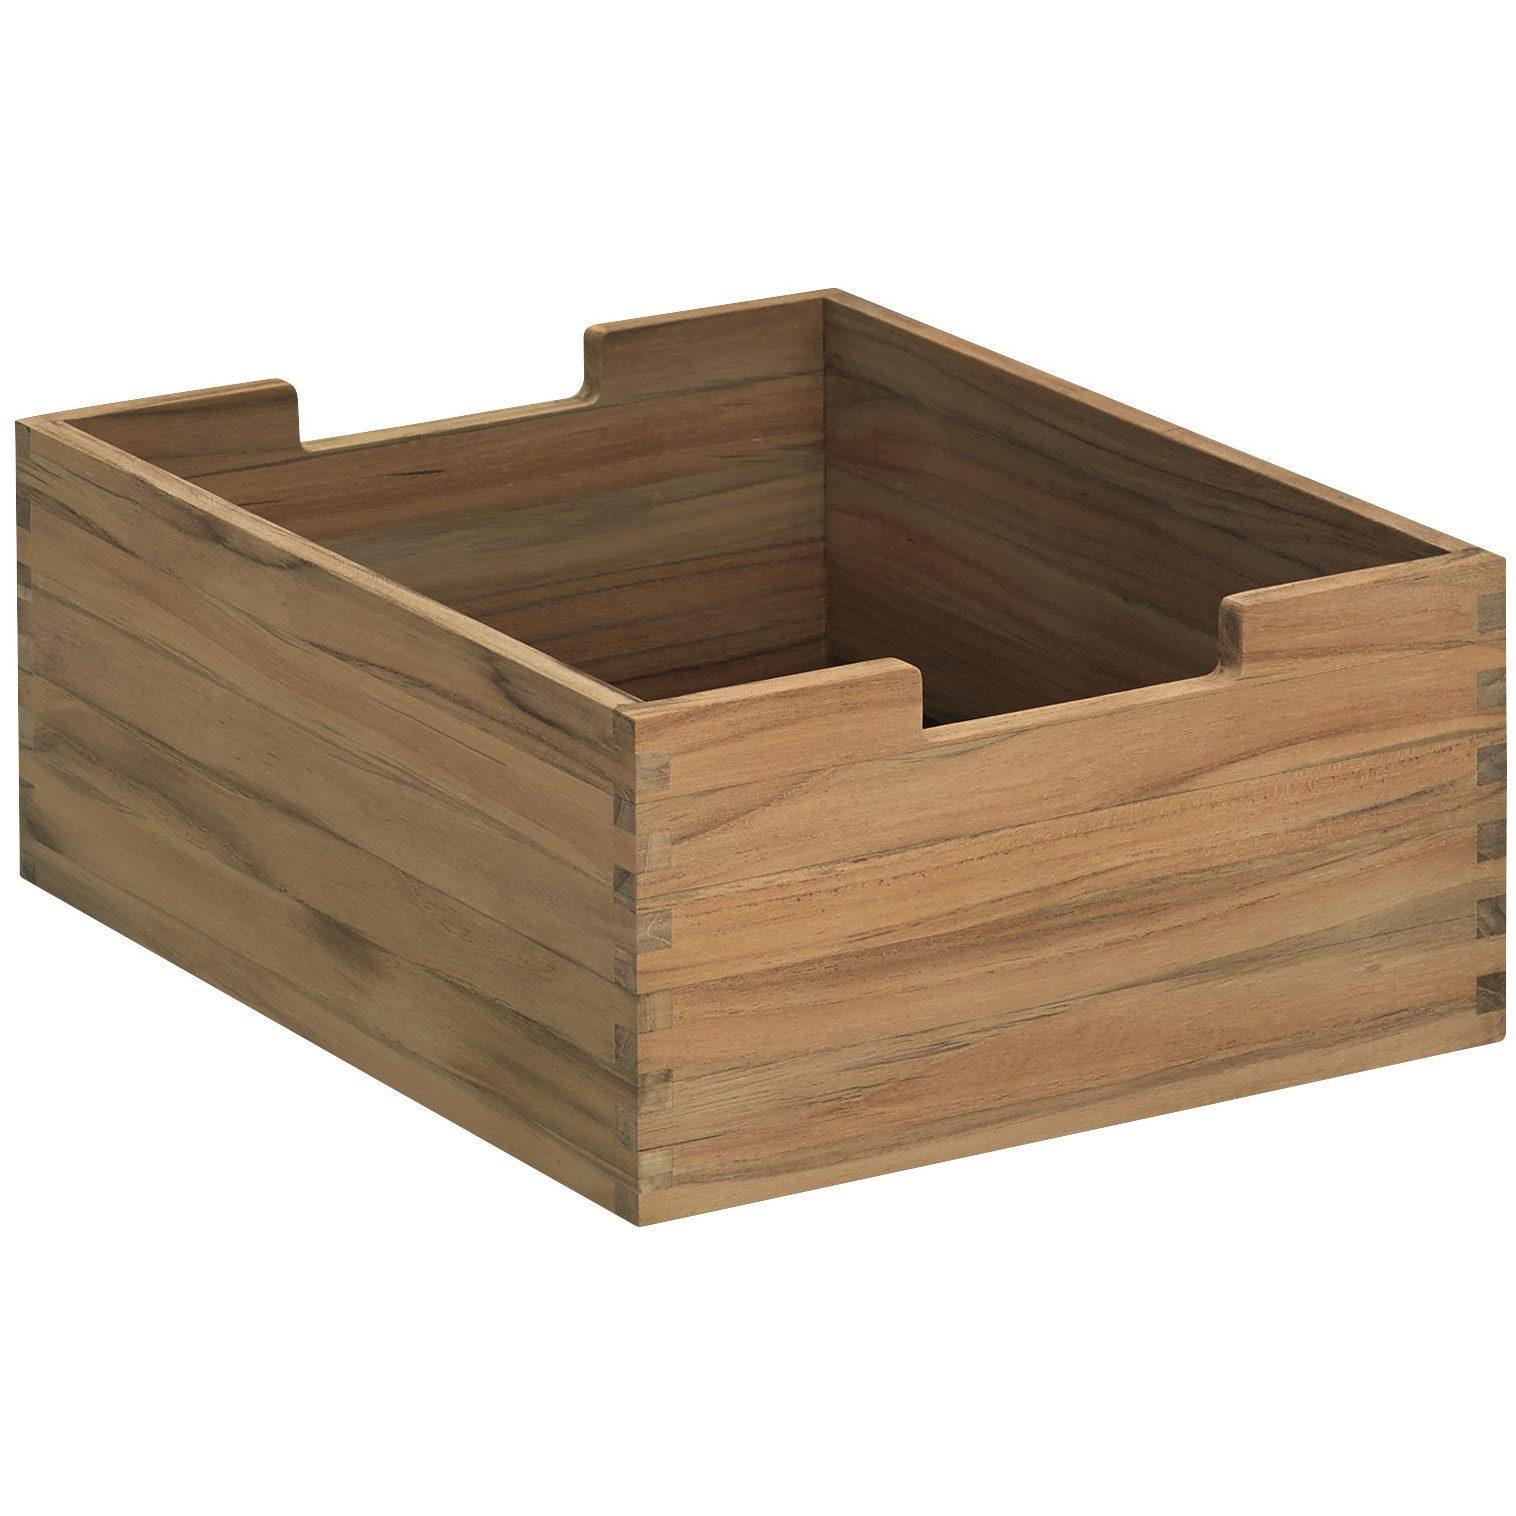 Cutter box liten i teak från Skagerak